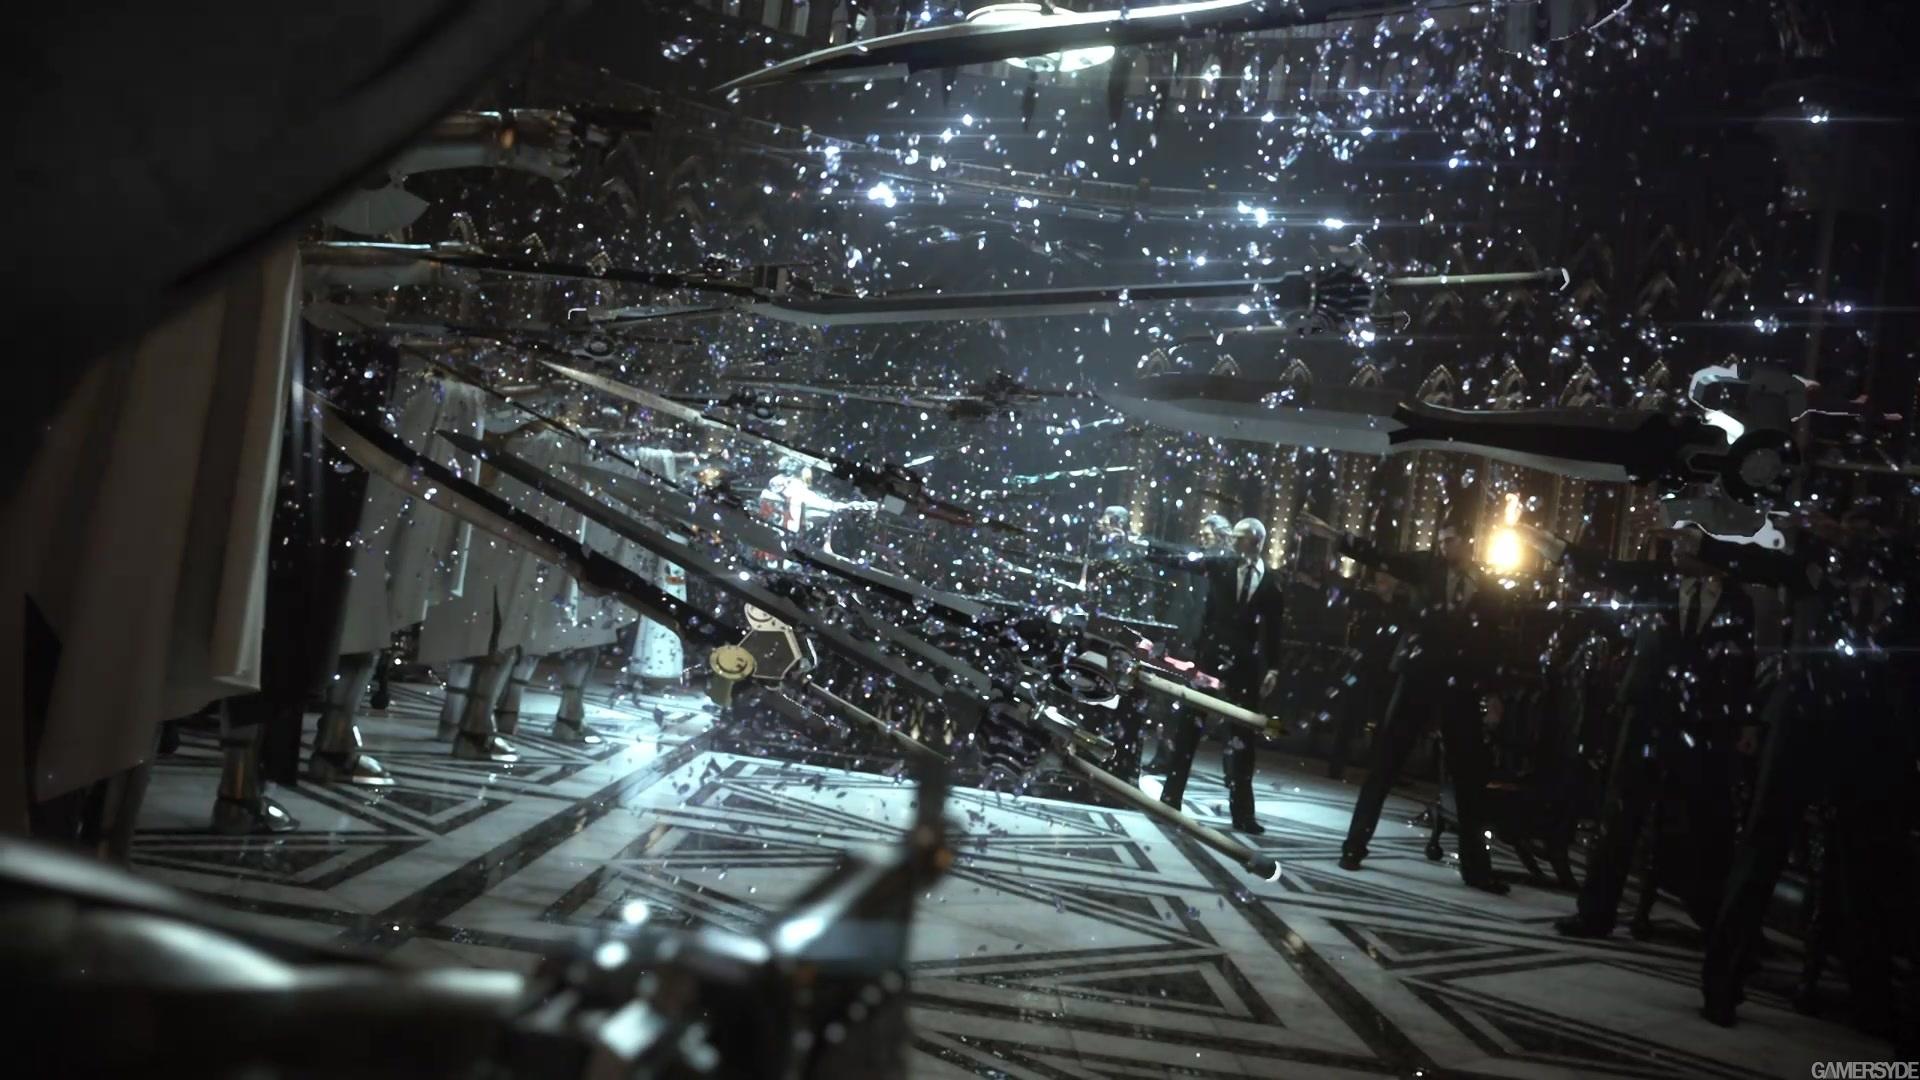 [46+] Final Fantasy XV Wallpaper on WallpaperSafari